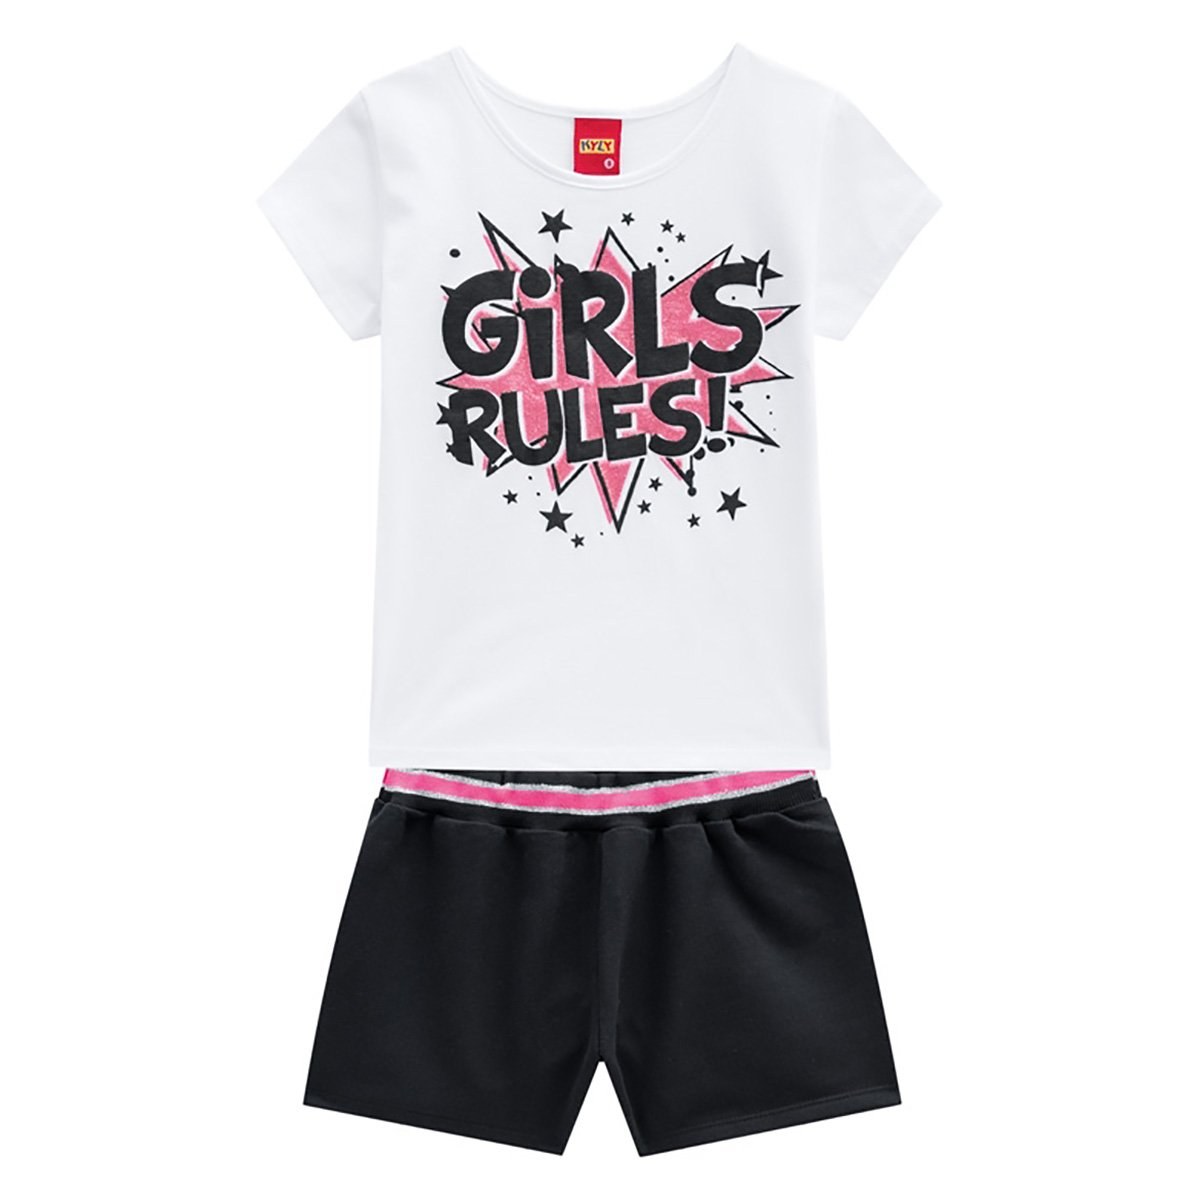 Conjunto Juvenil Kyly Camiseta + Short Girls Rules Feminino